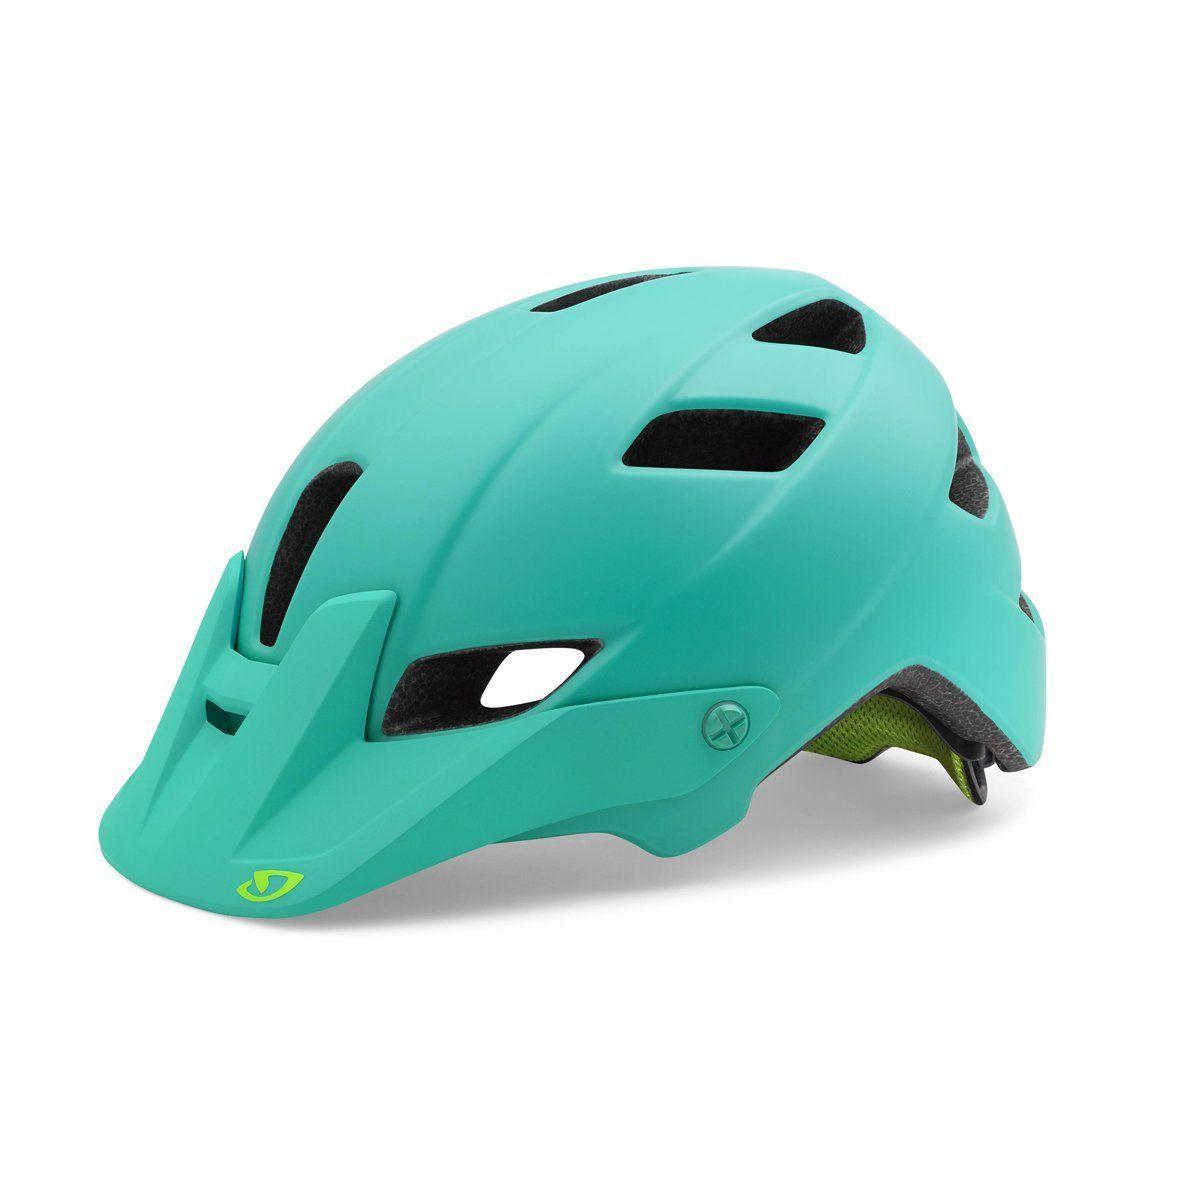 Giro Women S Feather Cycling Helmet Giro Amazon Co Uk Sports Outdoors Mountain Bike Helmets Bike Helmet